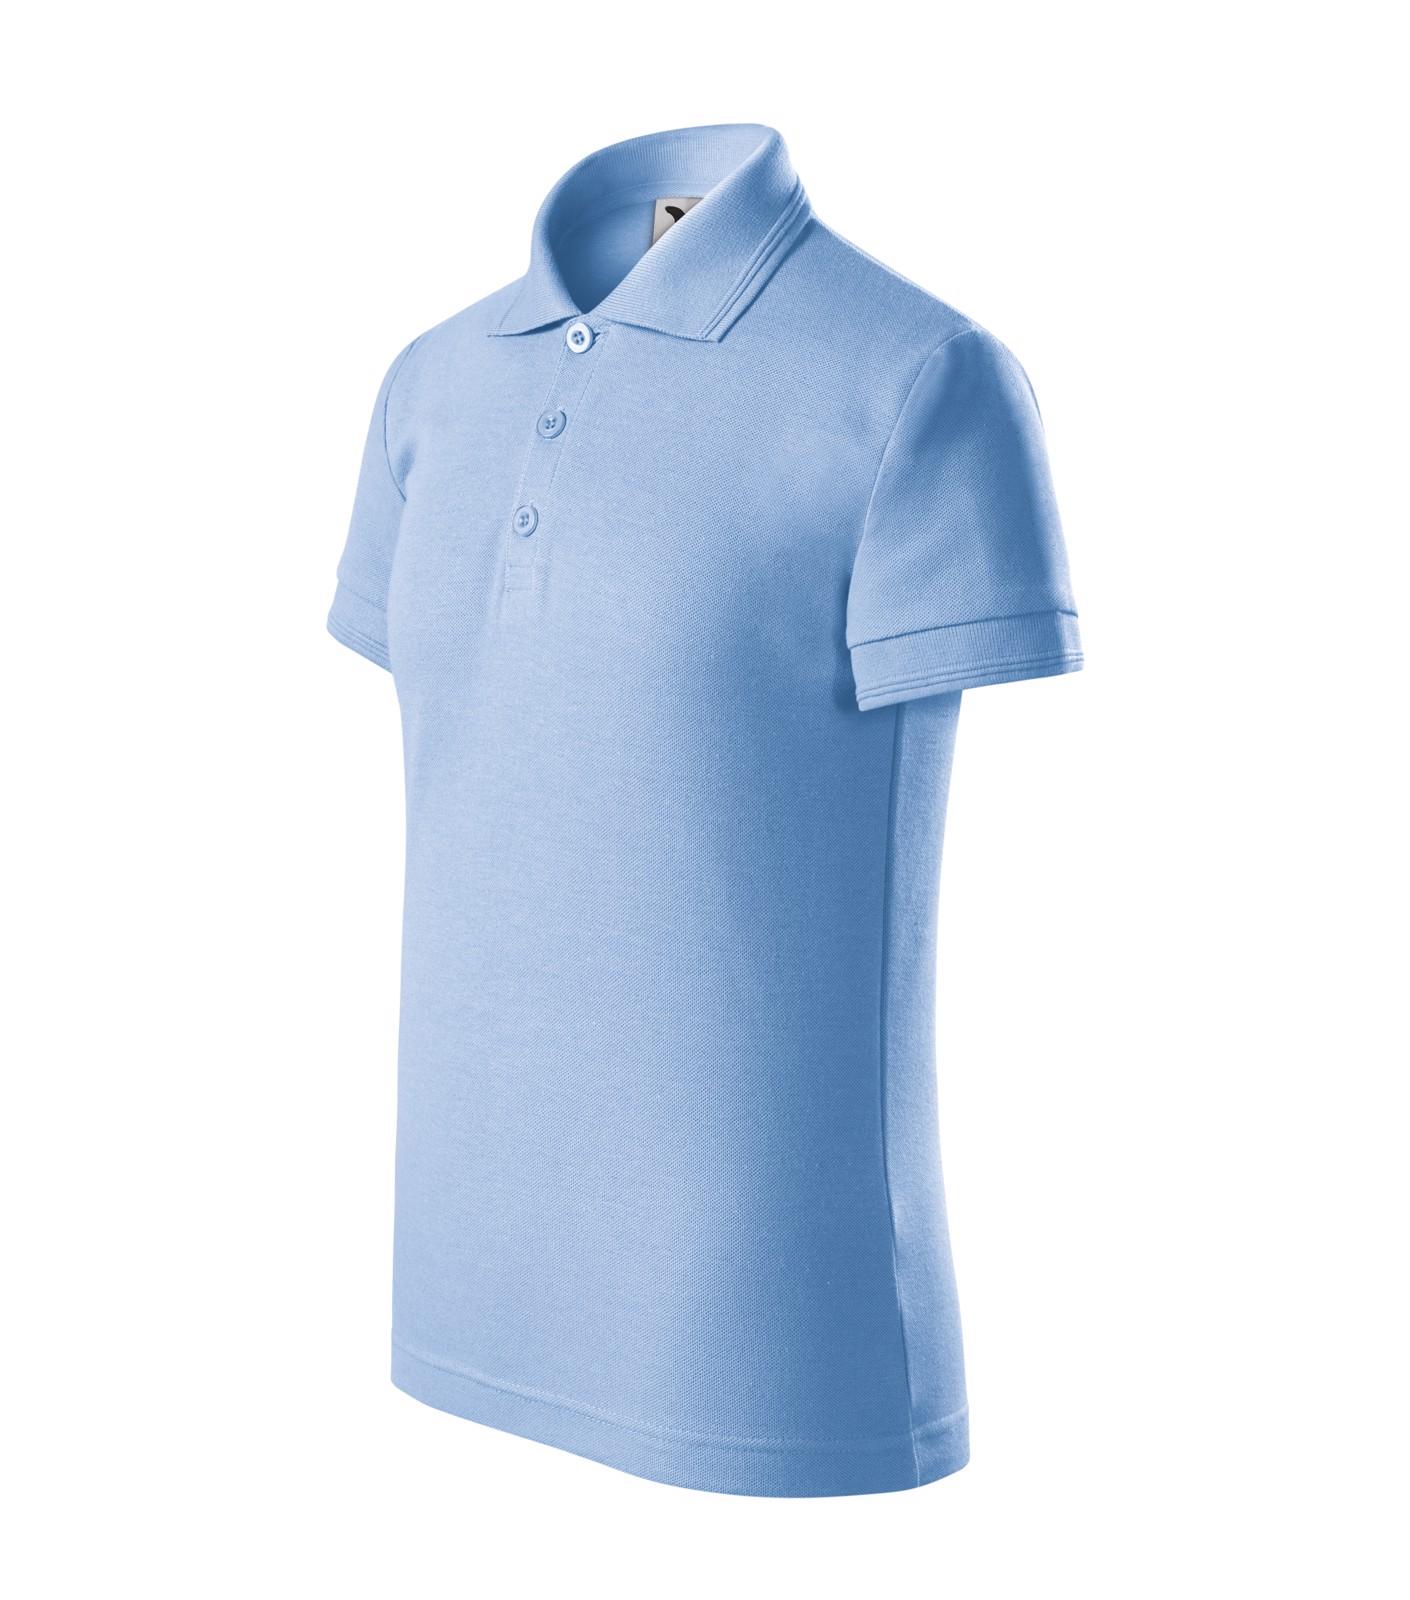 Polokošile dětská Malfini Pique Polo - Nebesky Modrá / 110 cm/4 roky